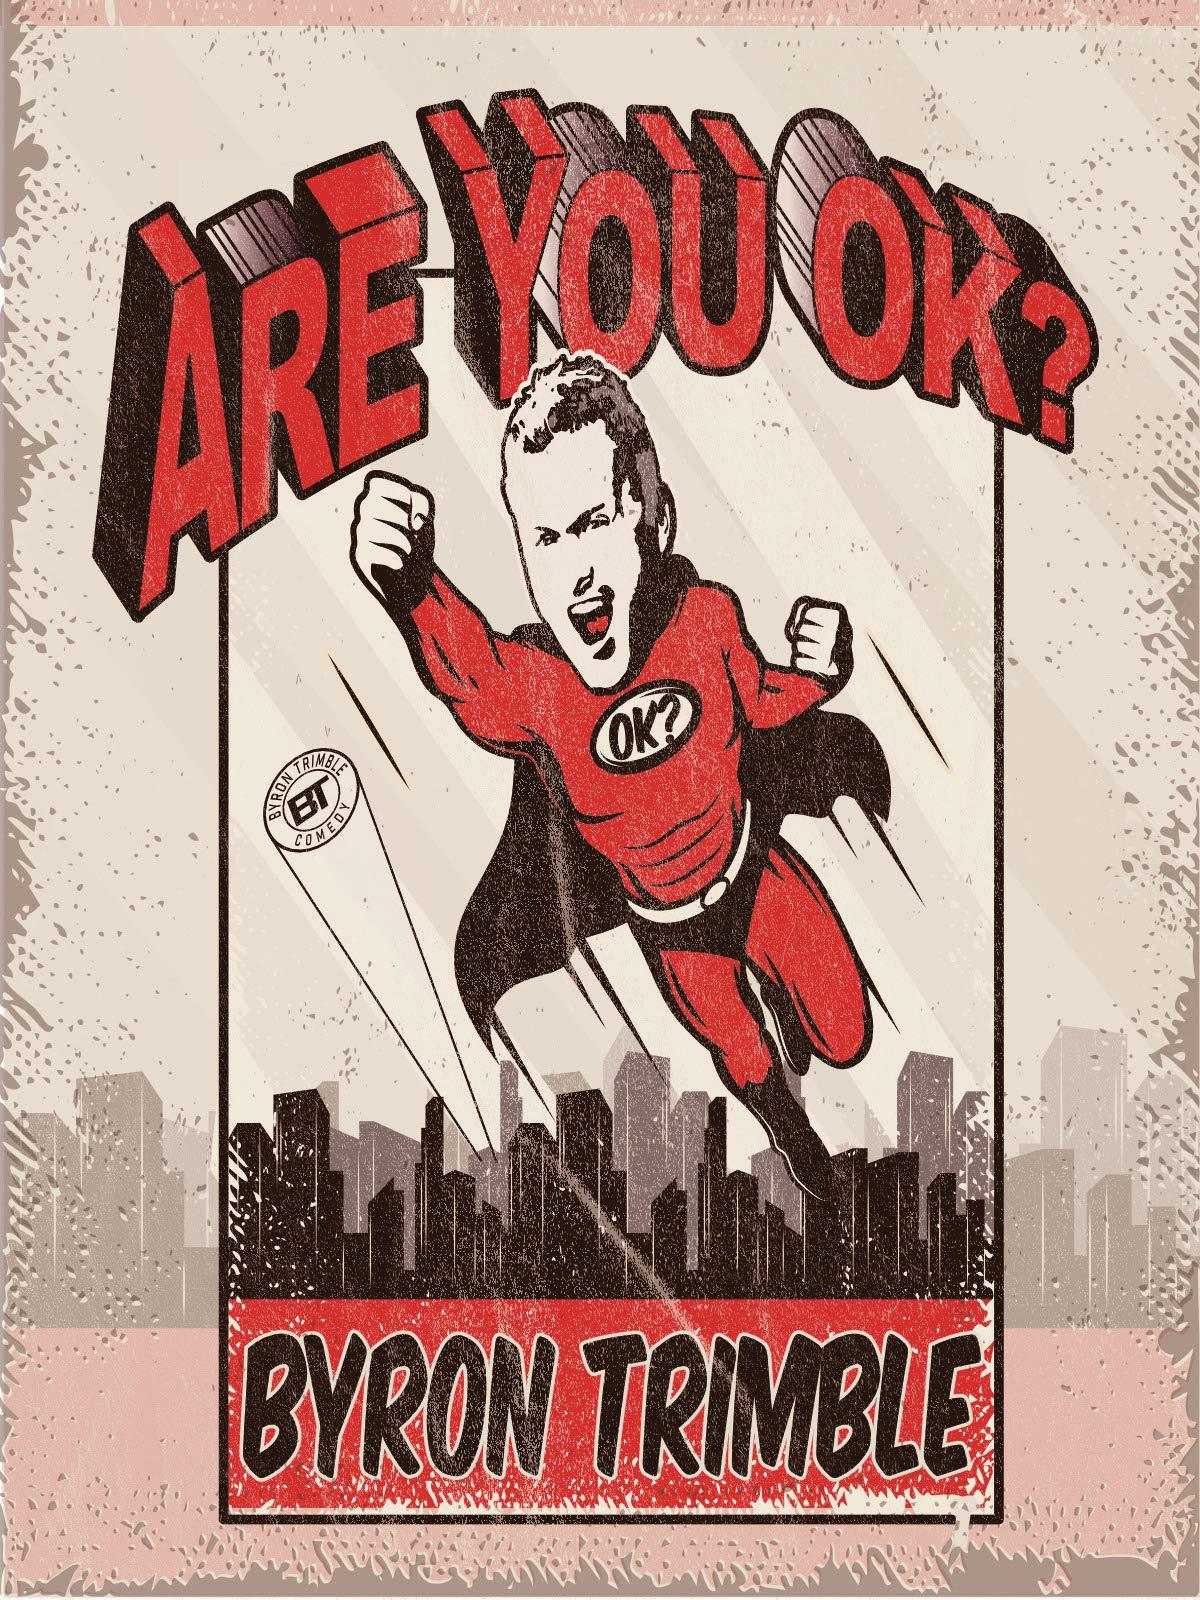 Byron Trimble: Are You OK?